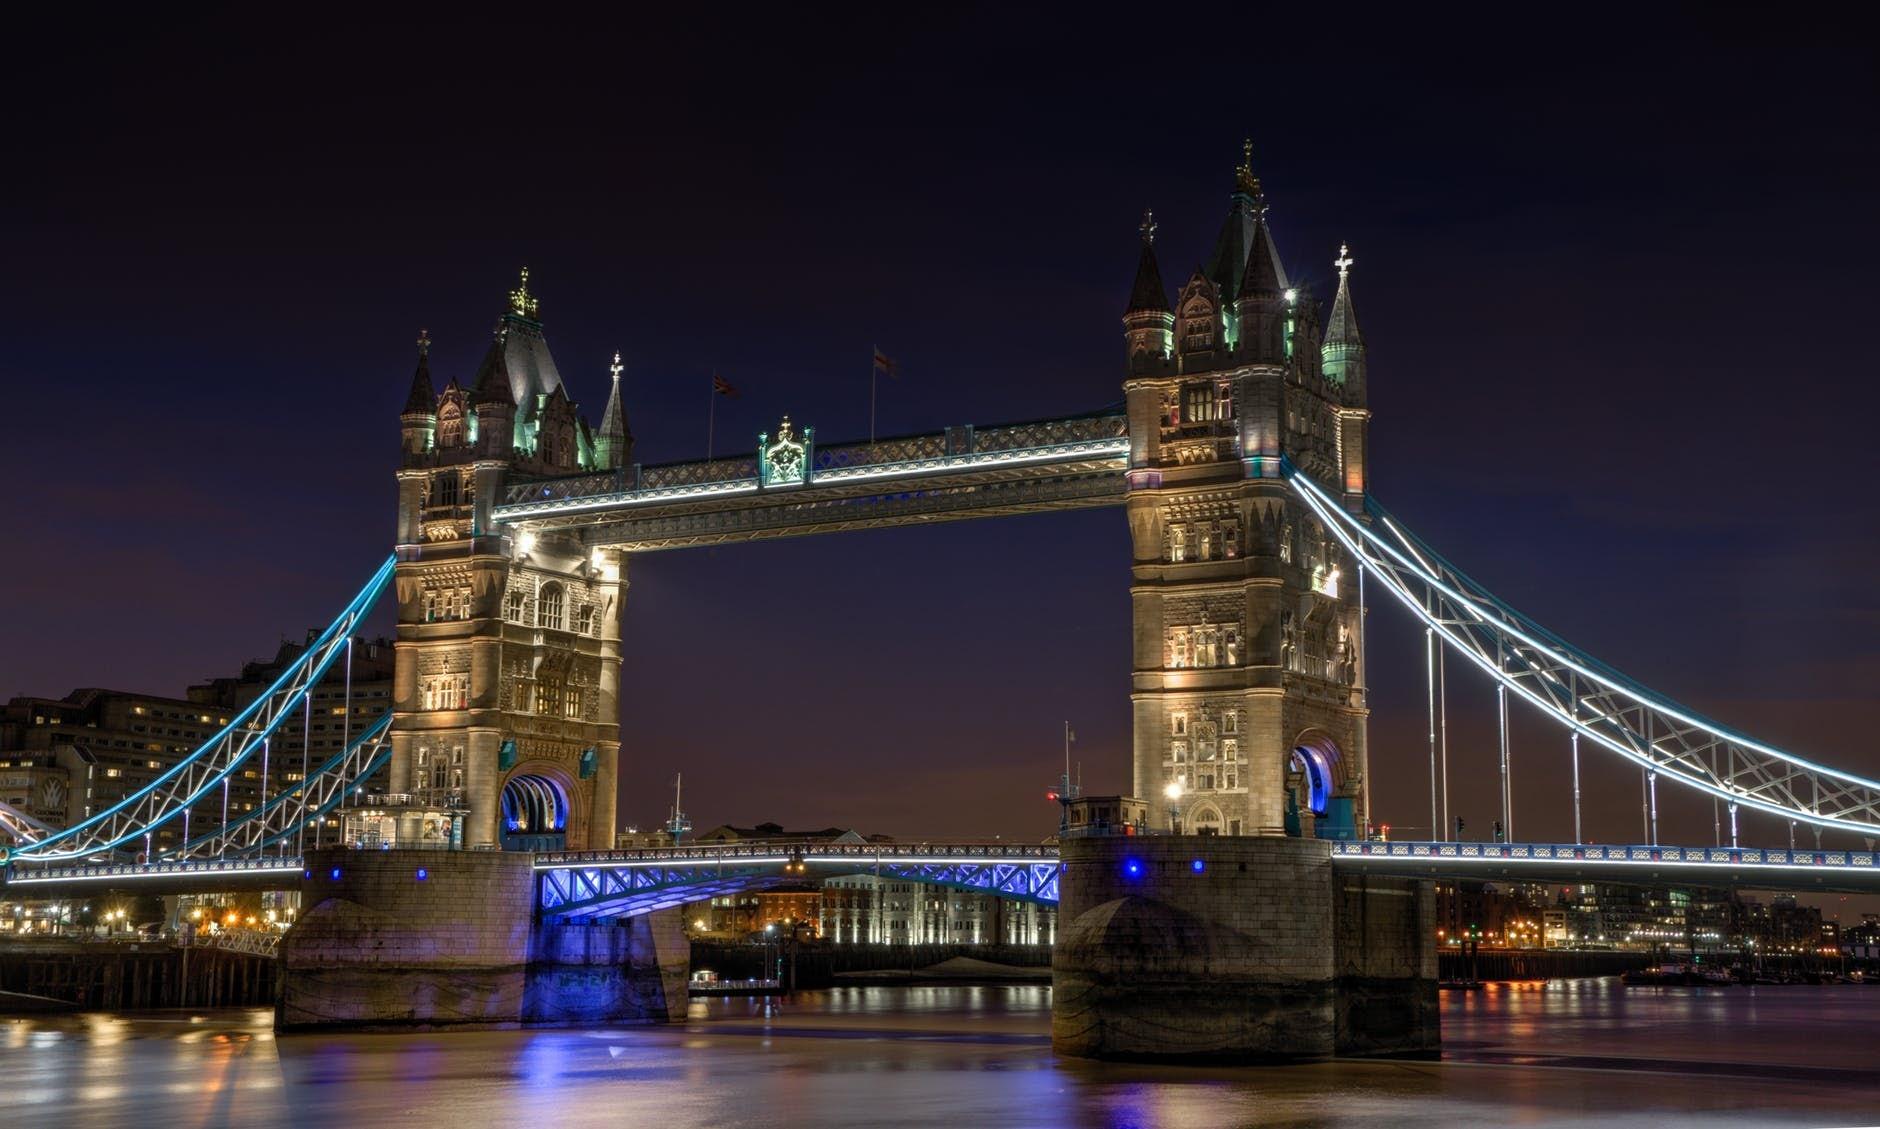 England's Famous Tower Bridge